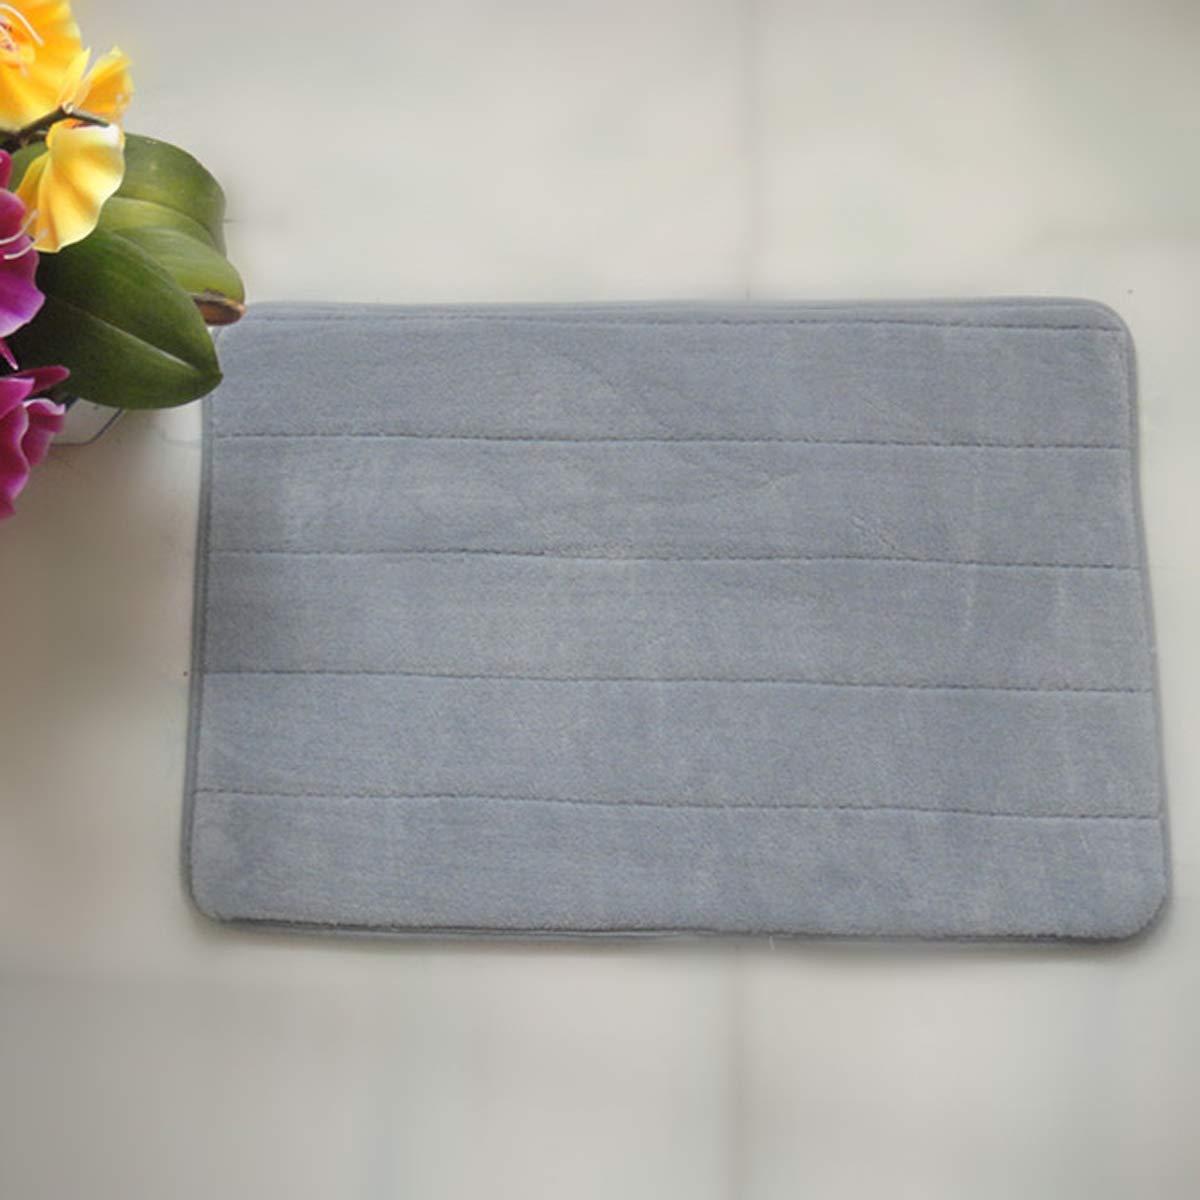 VORCOOL 4060cm Rectangle Shaped Soft Memory Foam Non-Slip Bath Mat Kitchen Mat Floor Rug Mat Carpet (Silver Grey)